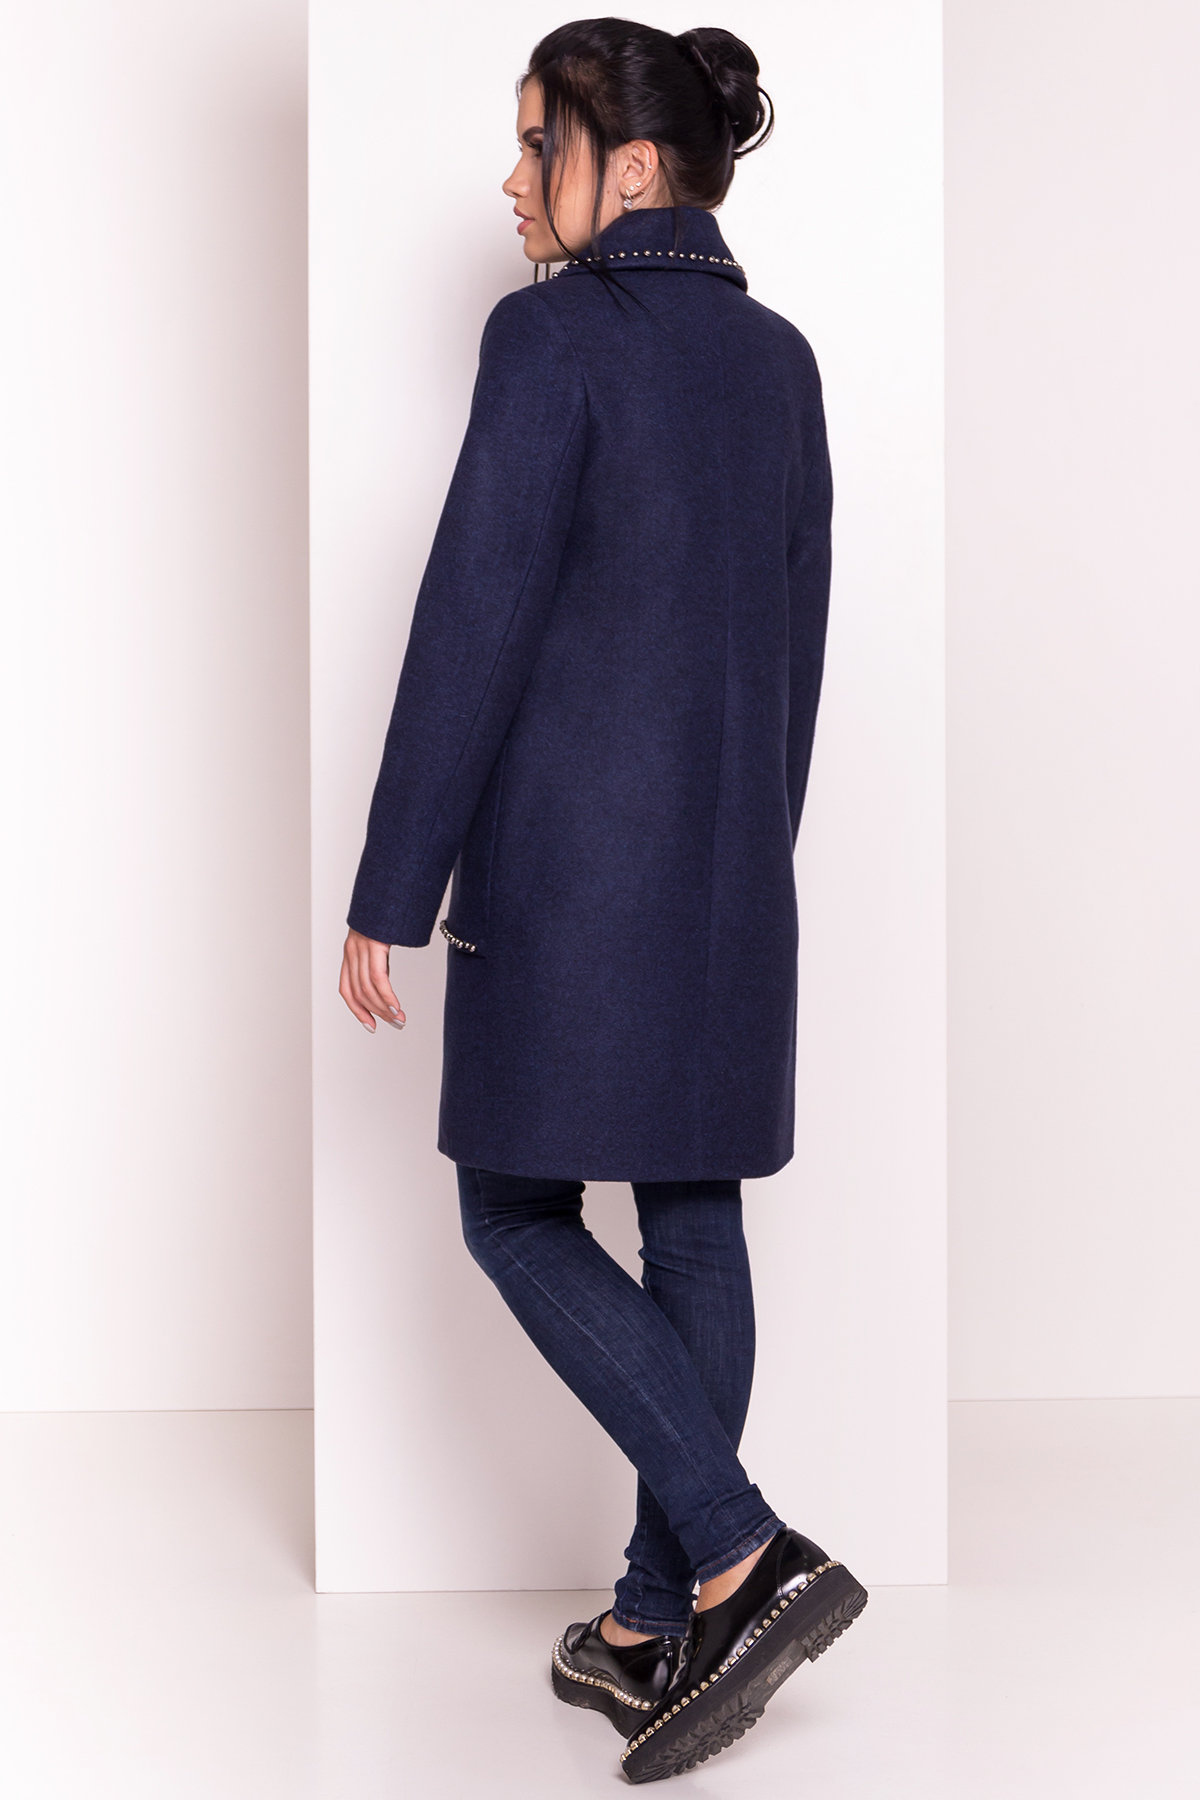 Пальто Кейси 5504 АРТ. 37032 Цвет: Темно-синий 17 - фото 5, интернет магазин tm-modus.ru